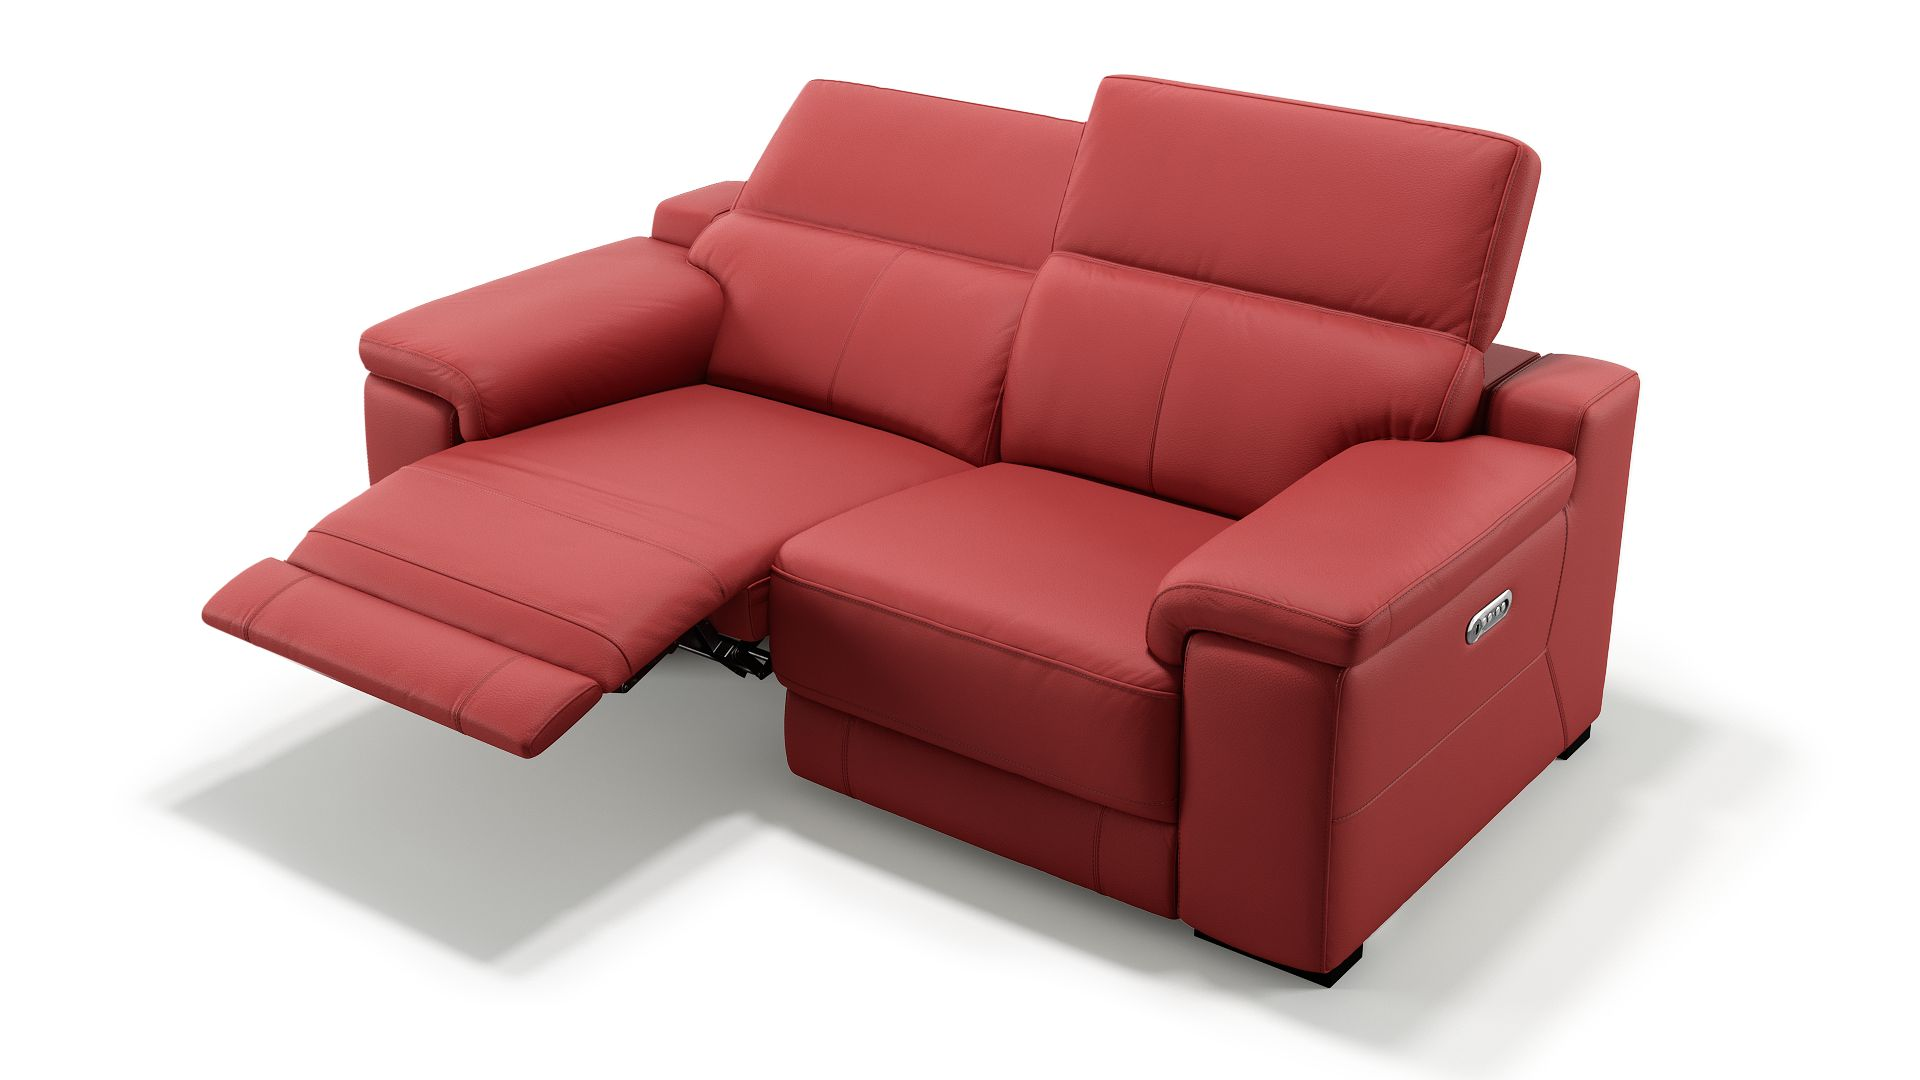 Leder 2-Sitzer Sofa SORA